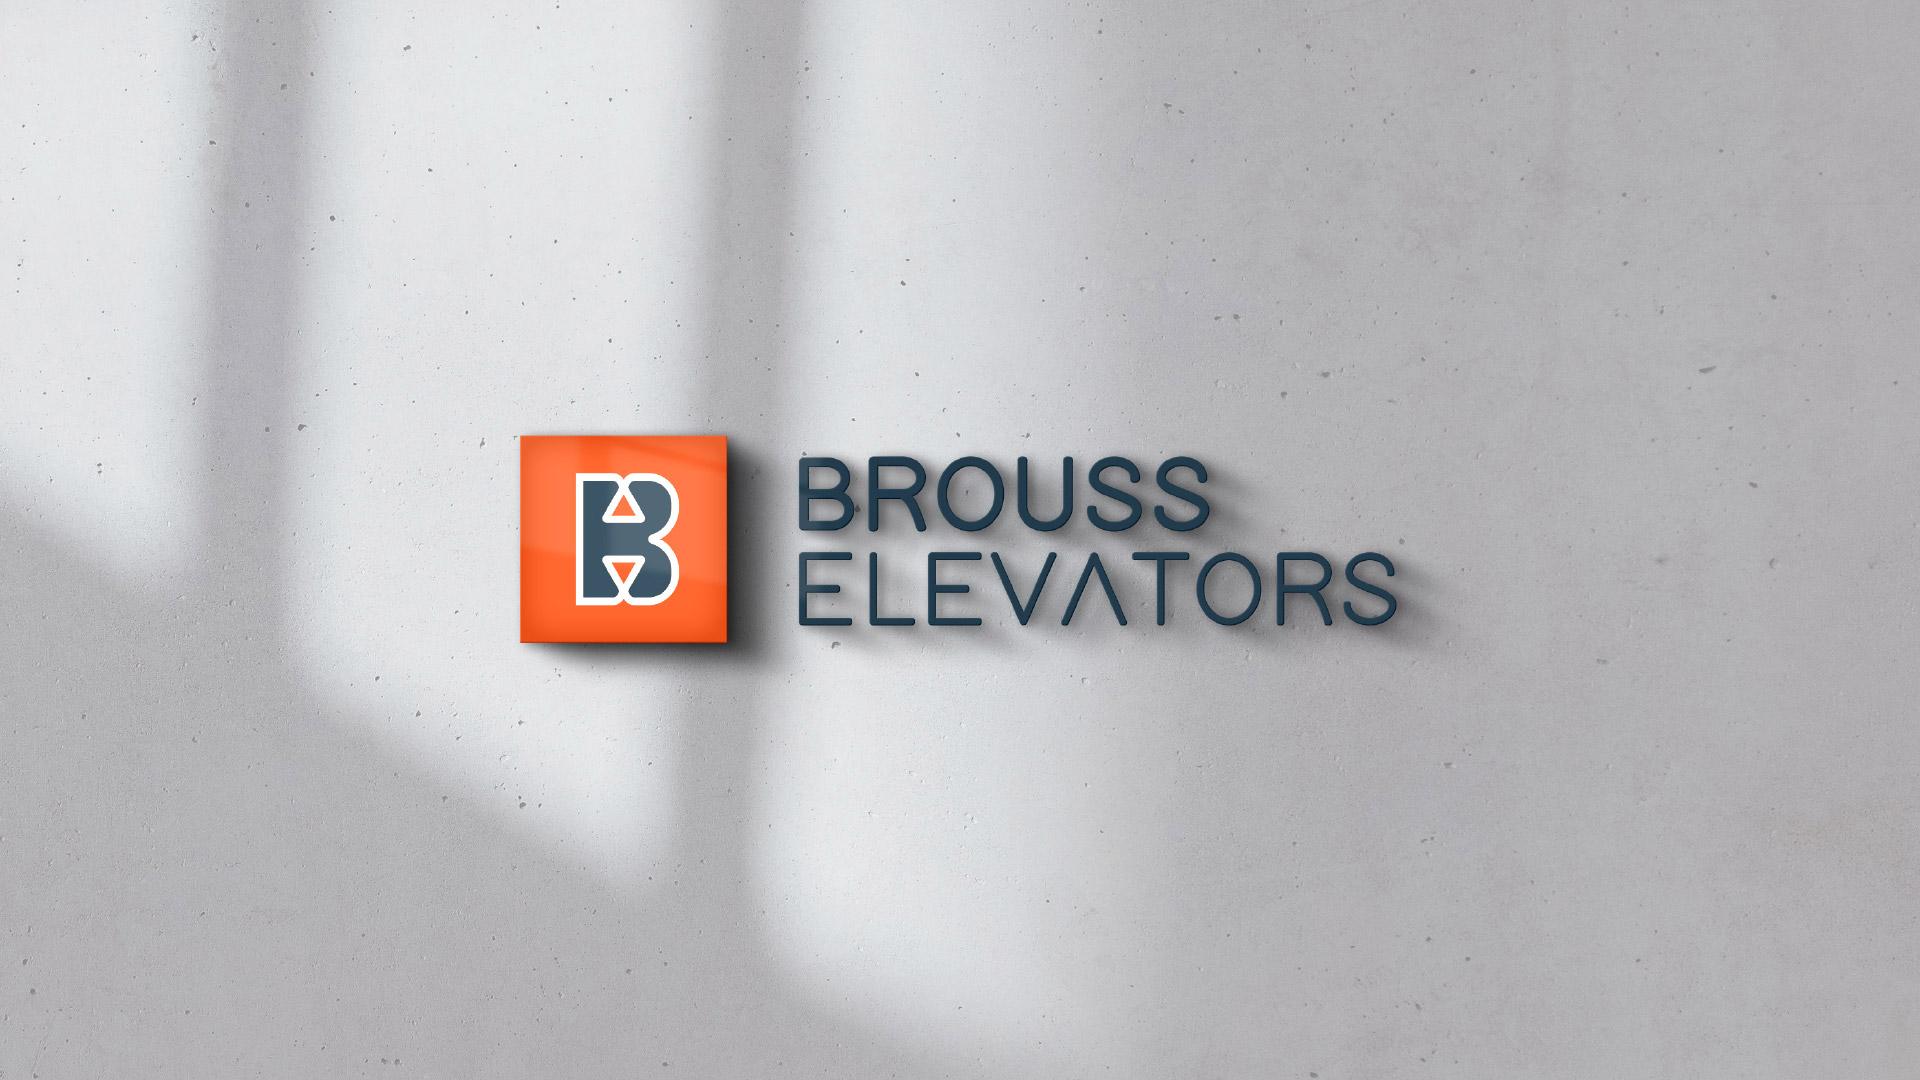 Brouss Elevators logo design by Kinetik Lab